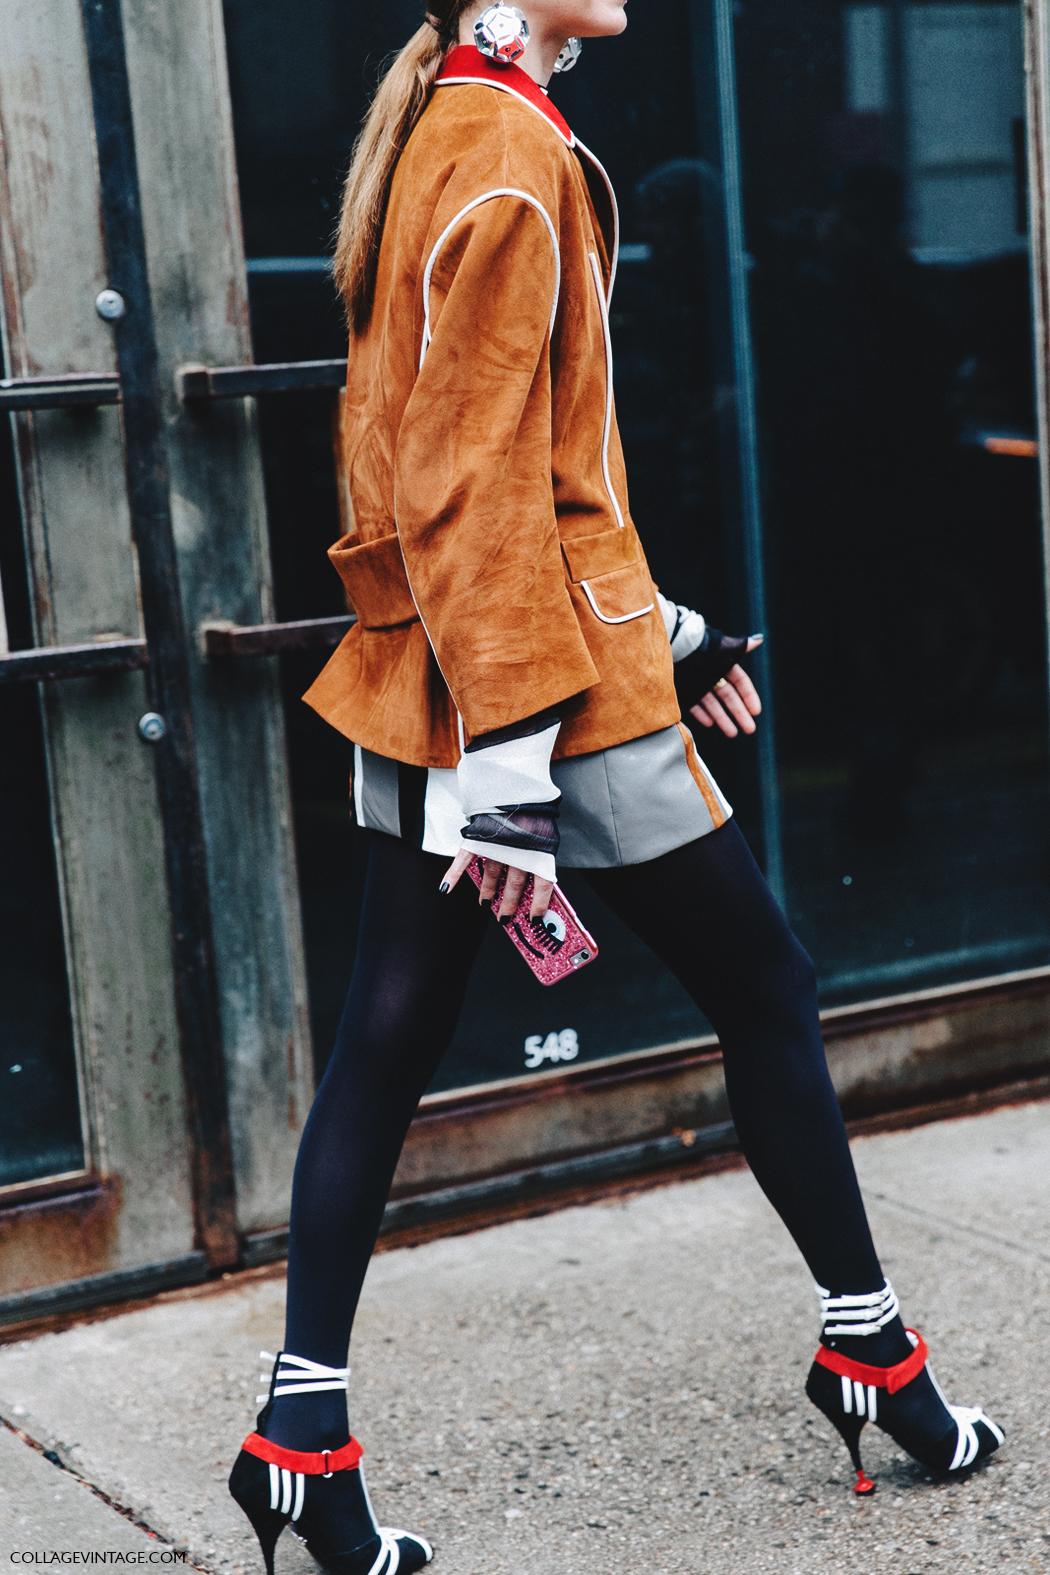 NYFW-New_York_Fashion_Week-Fall_Winter-17-Street_Style-Chiara_Ferragni-Prada_Jacket-Prada_Earrings-